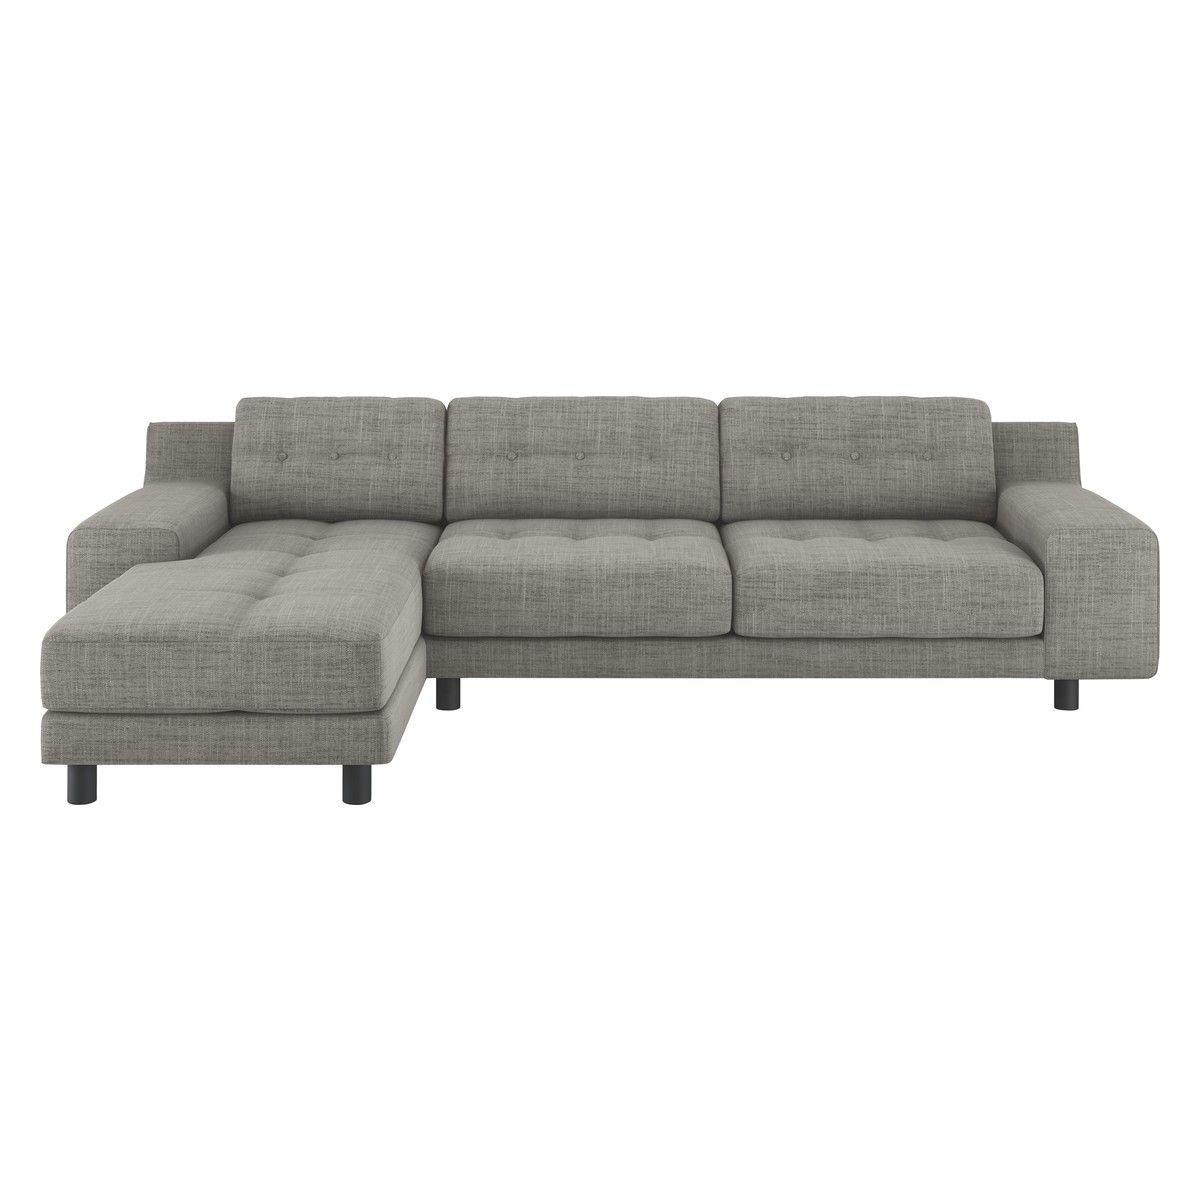 HENDRICKS Black And White Italian Woven Fabric Left Arm Chaise Sofa